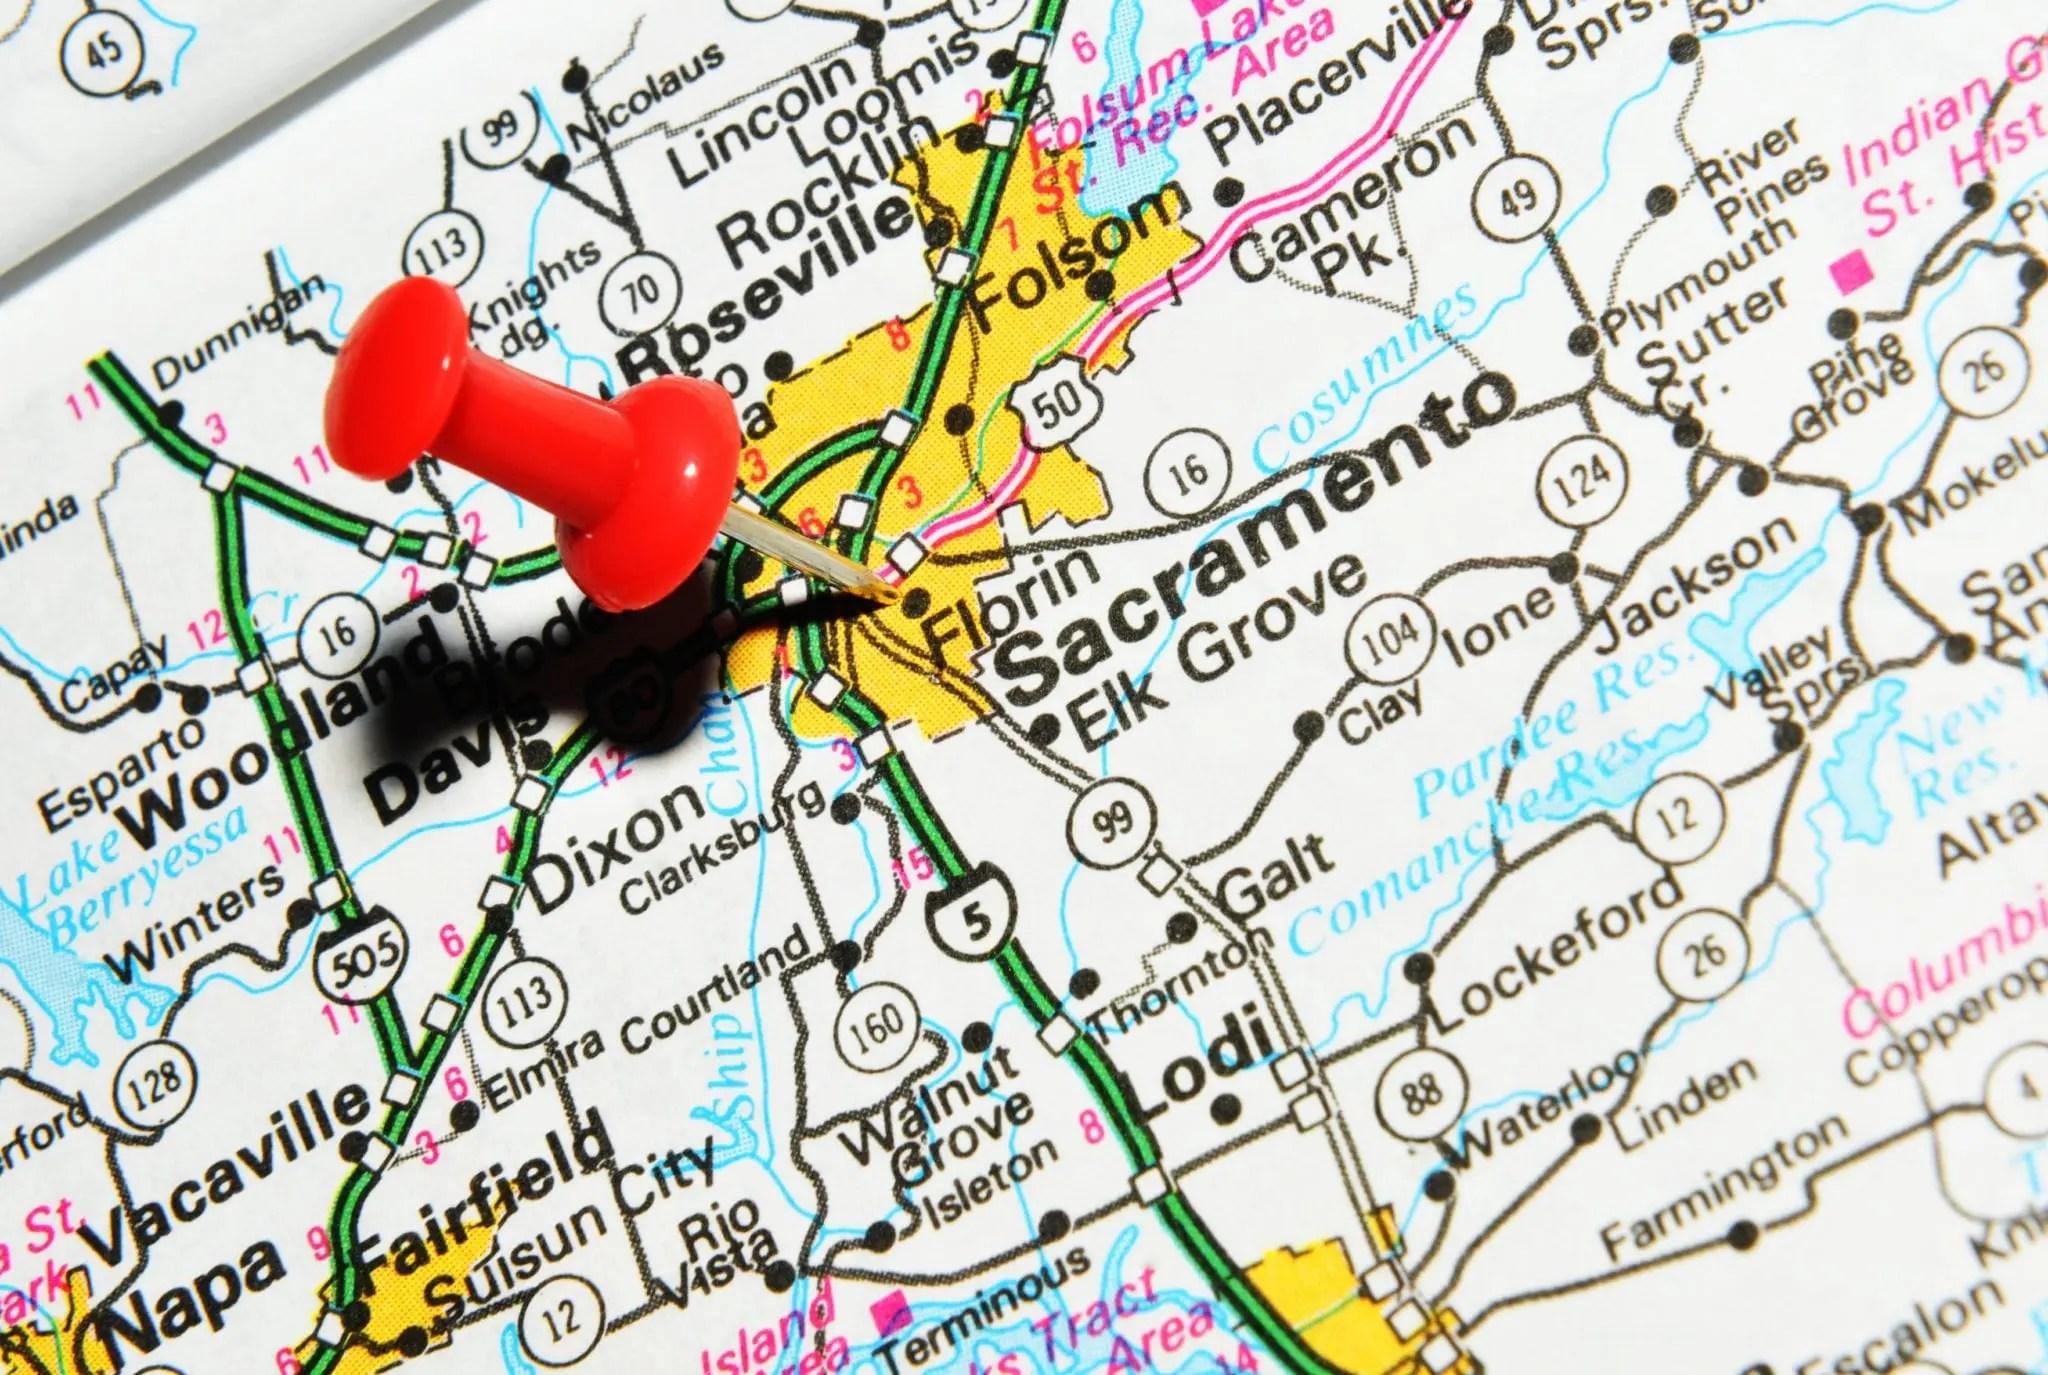 Verizon Reveals How It Found The Secret To Smart Cities In Sacramento